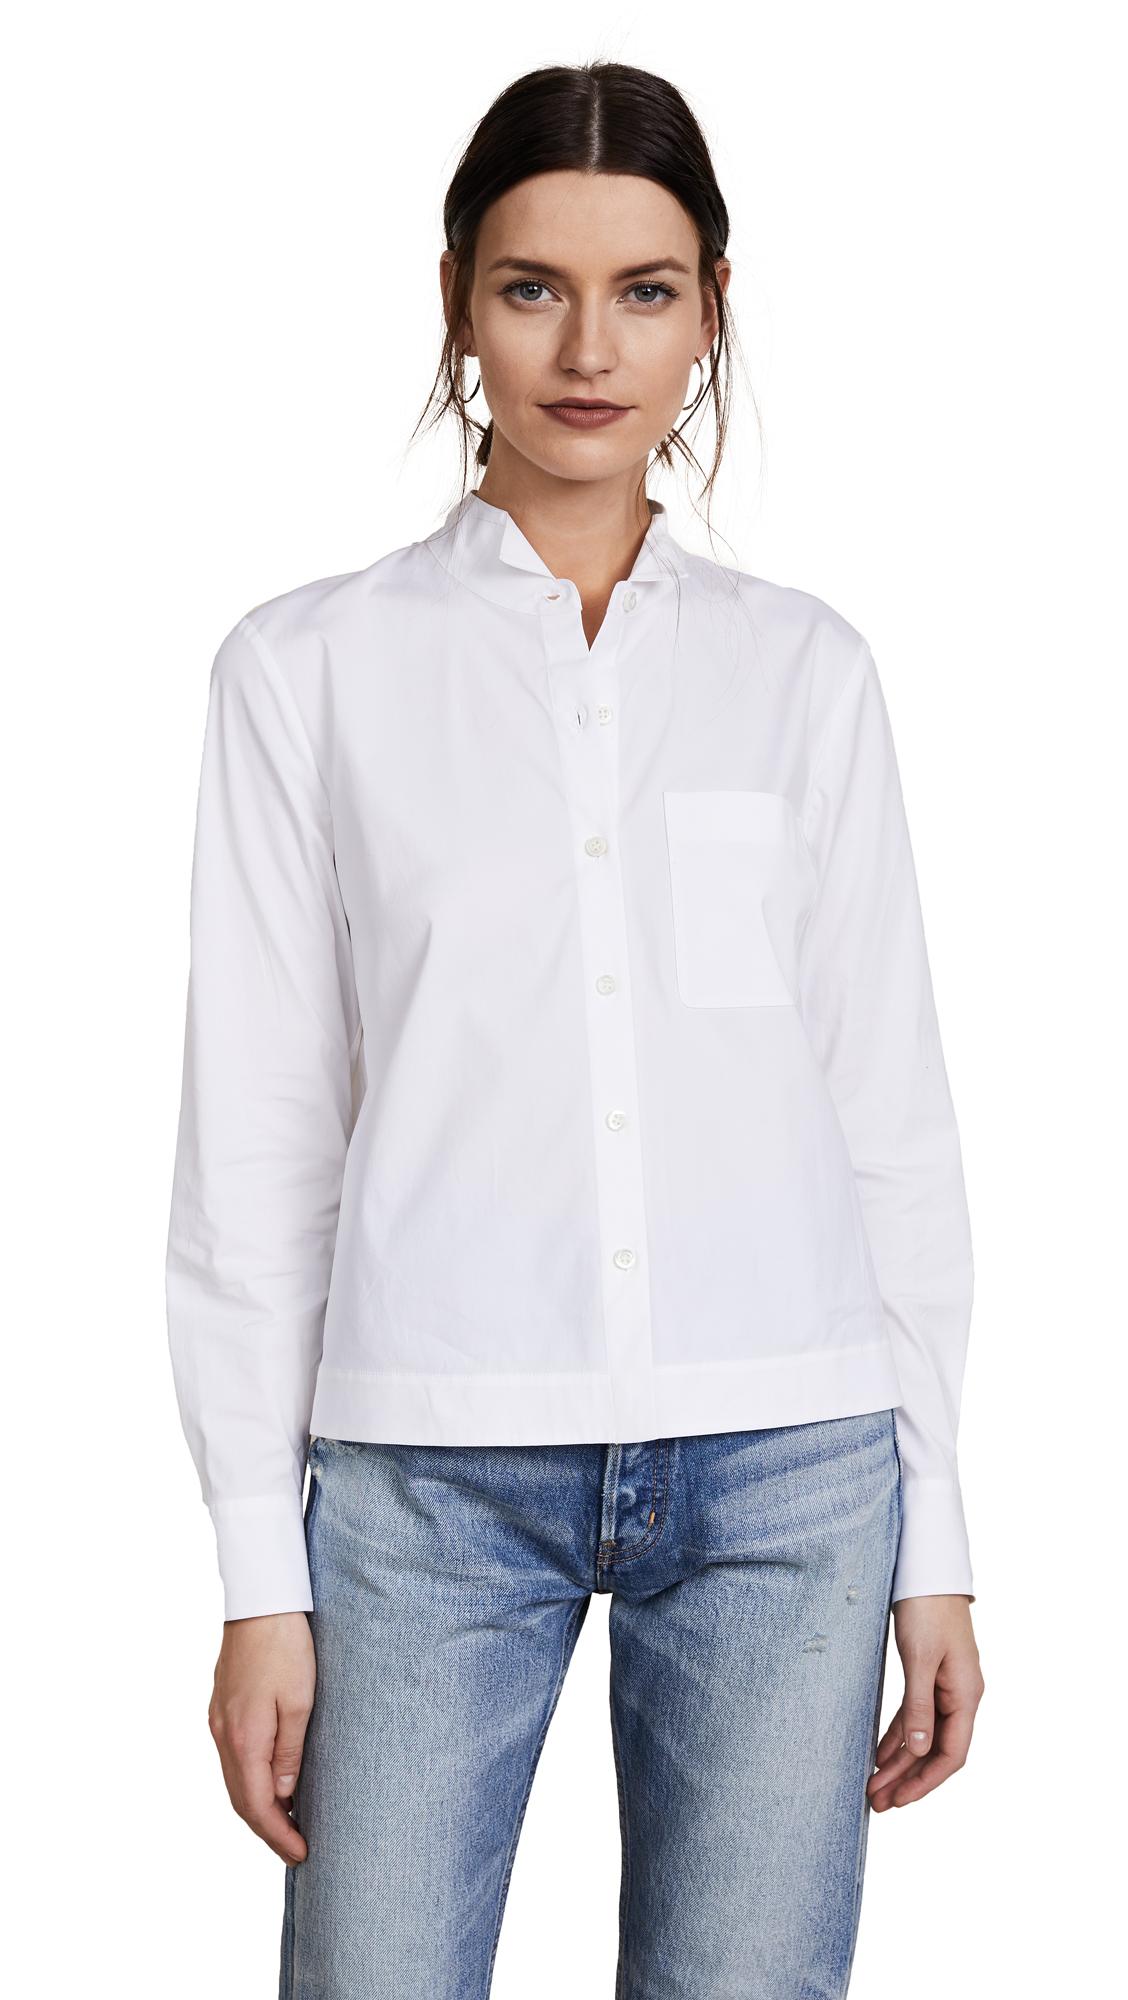 Theory Boy Shirt - White